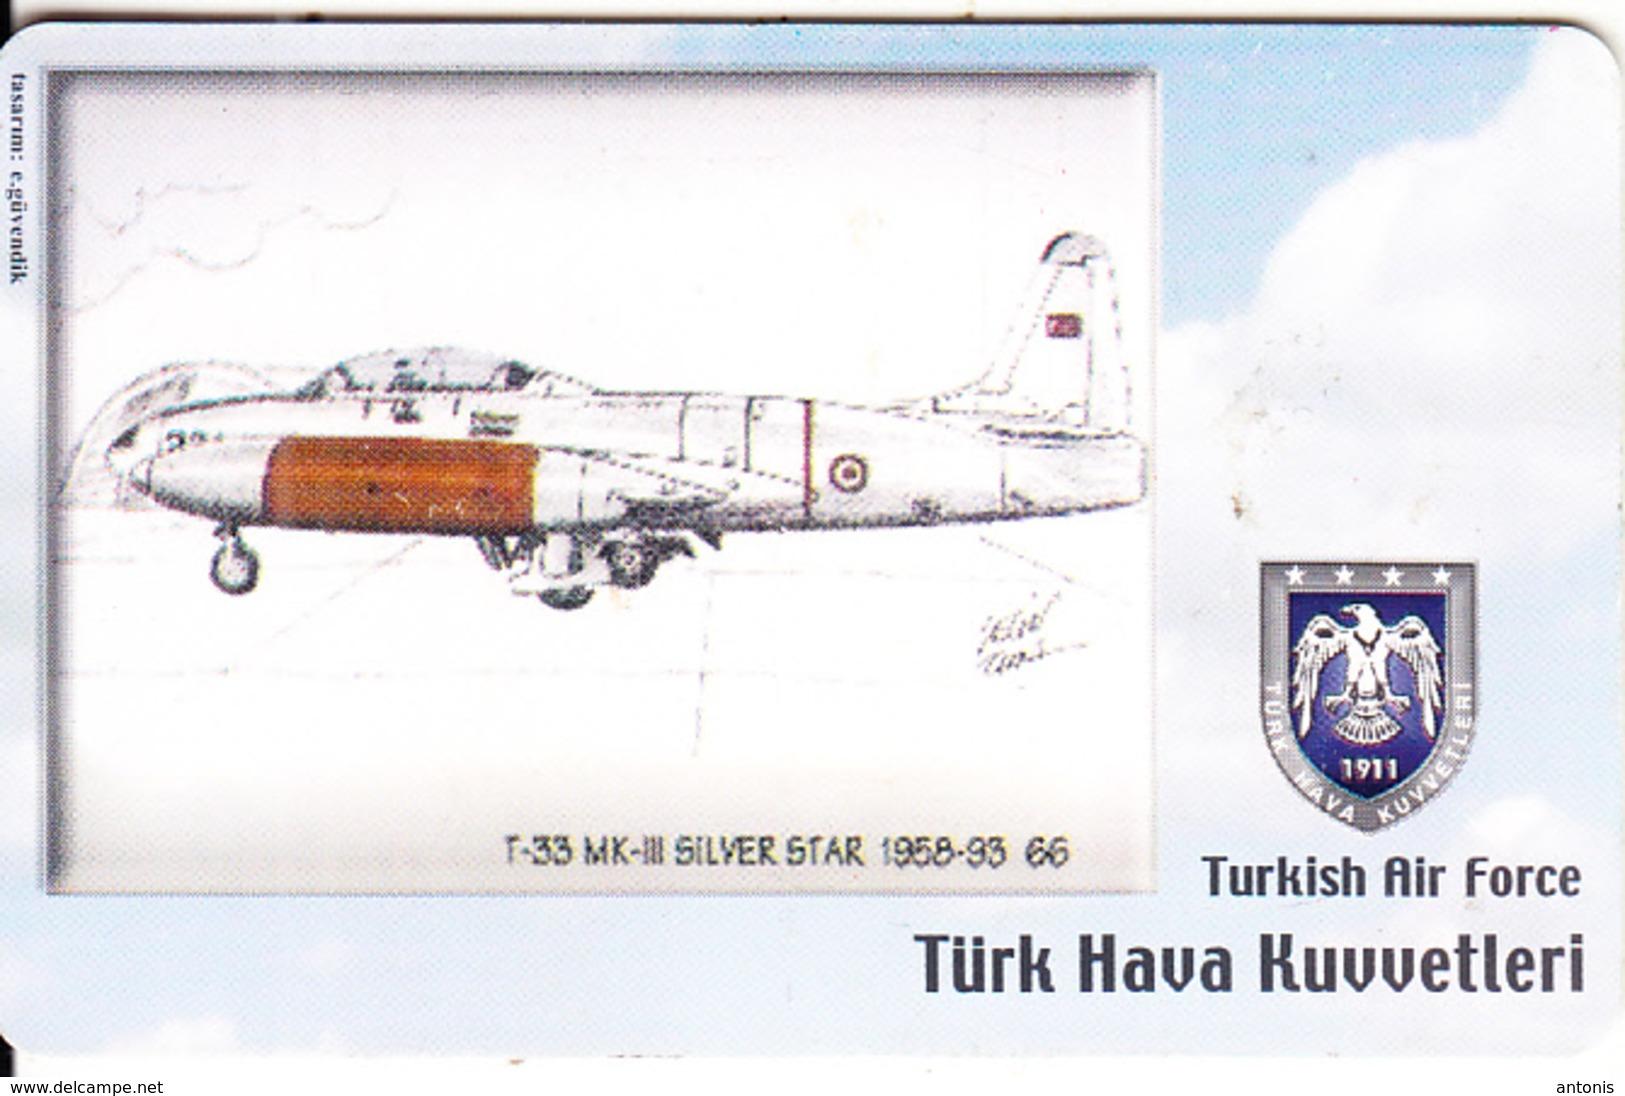 TURKEY(chip) - Airplane, T-33 MK-III Silver Star 1958-93 66(50 Units), Used - Avions